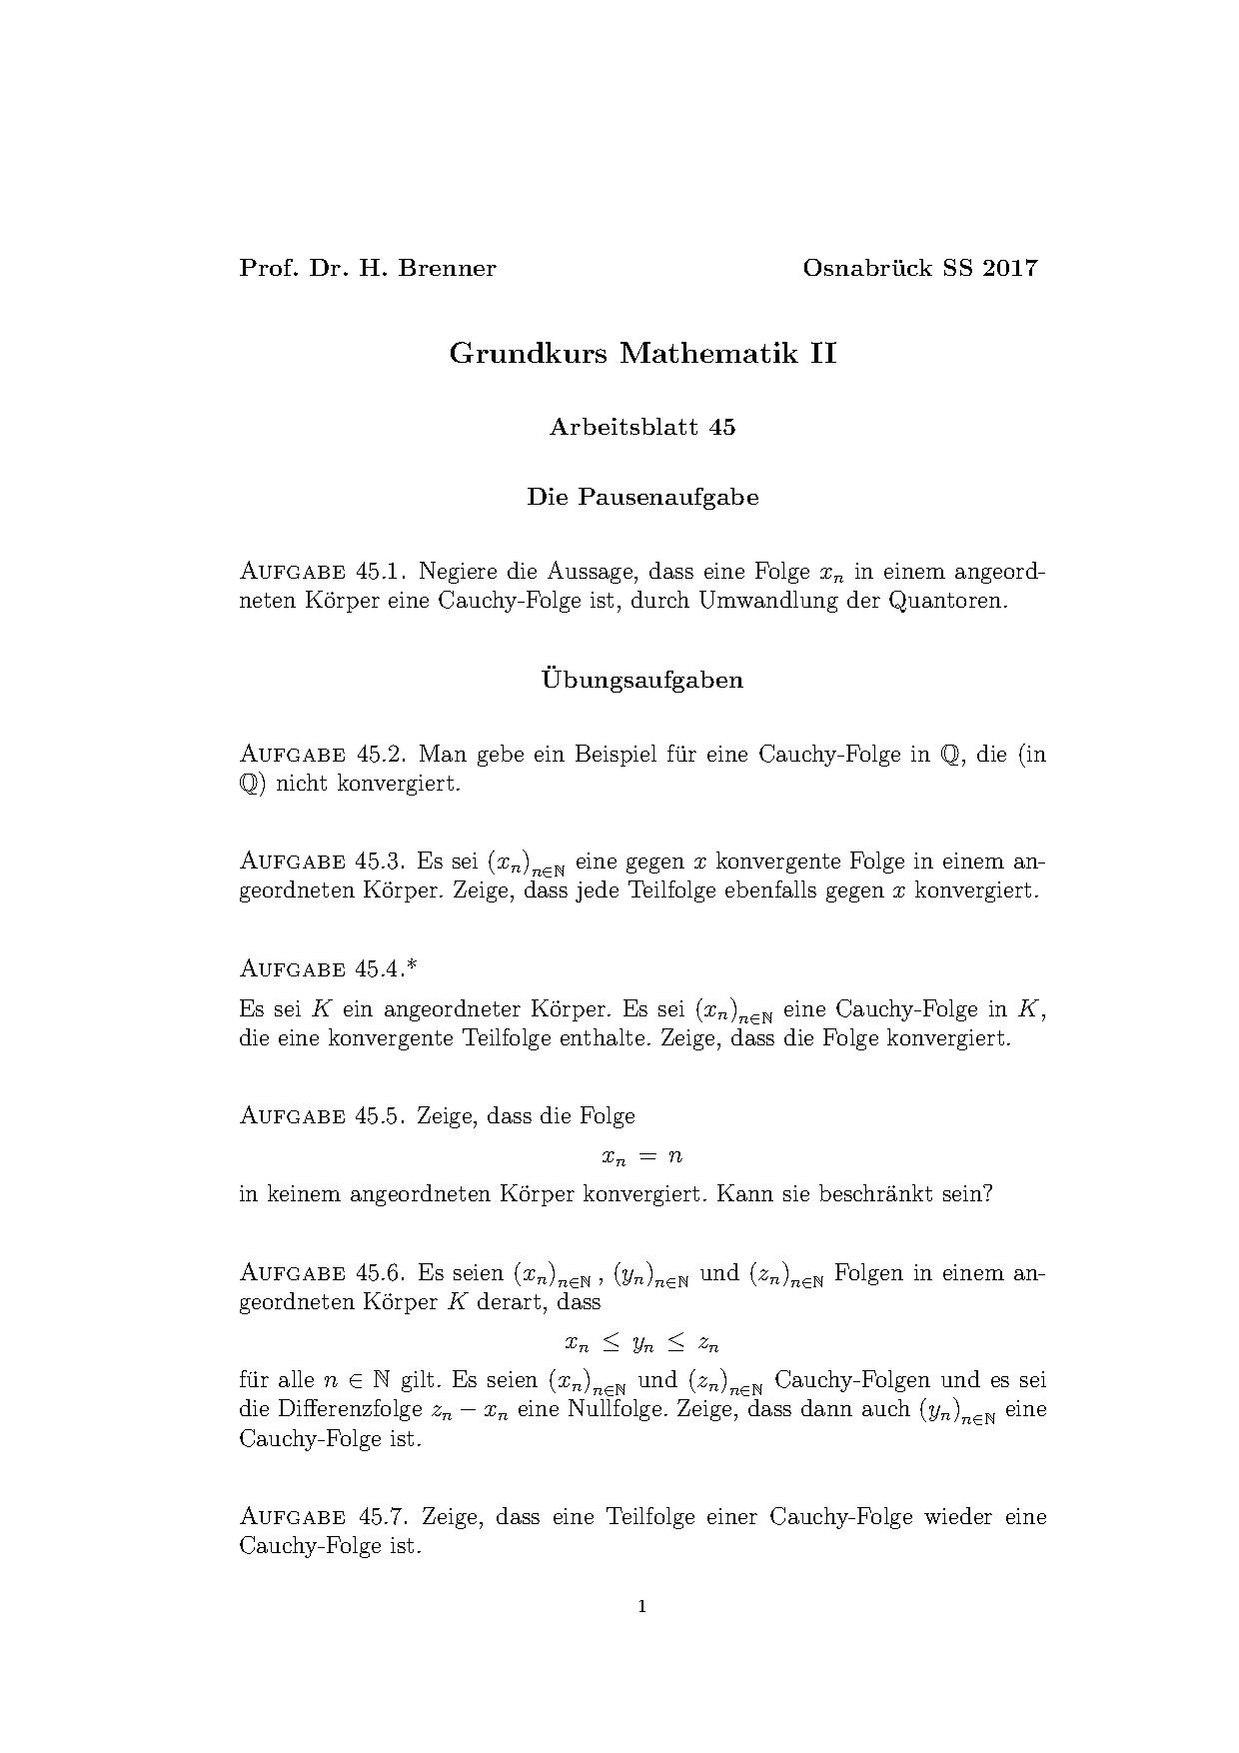 Beste Mathe Arbeitsblatt 4 Grad Ideen - Super Lehrer Arbeitsblätter ...